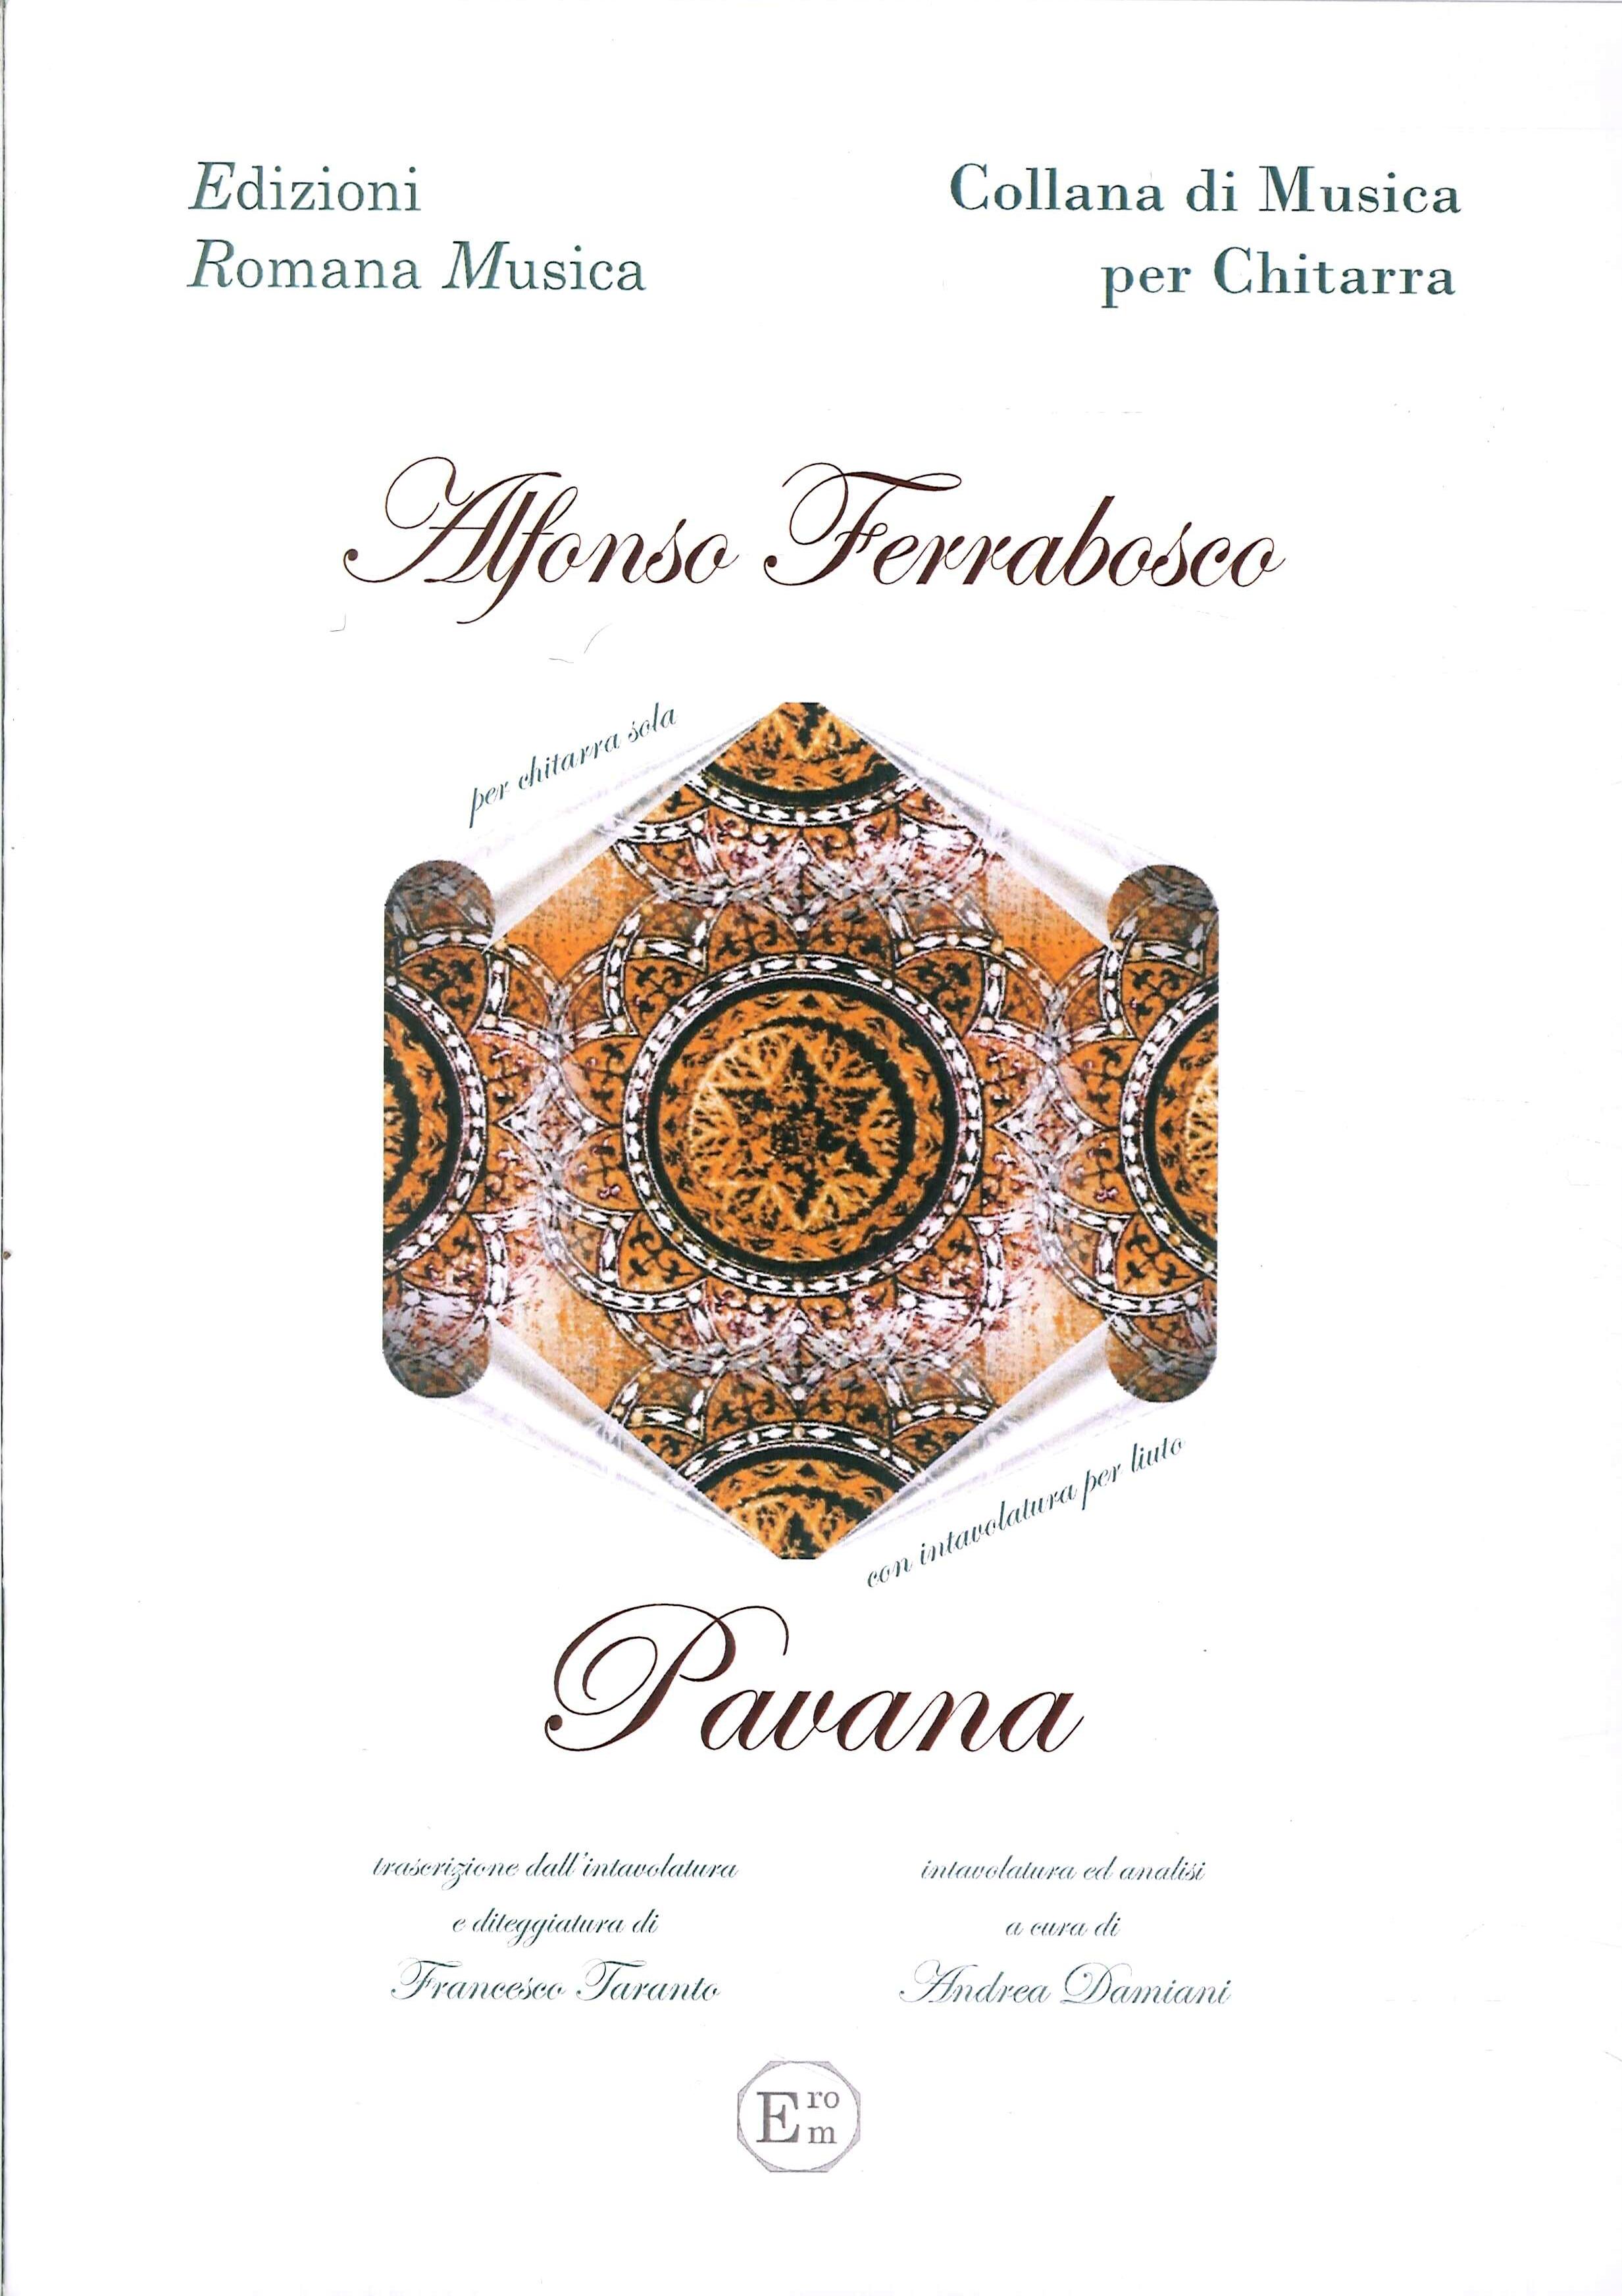 Alfonso Ferrabosco. Pavana. Musica per Chitarra e liuto. Erom 0045